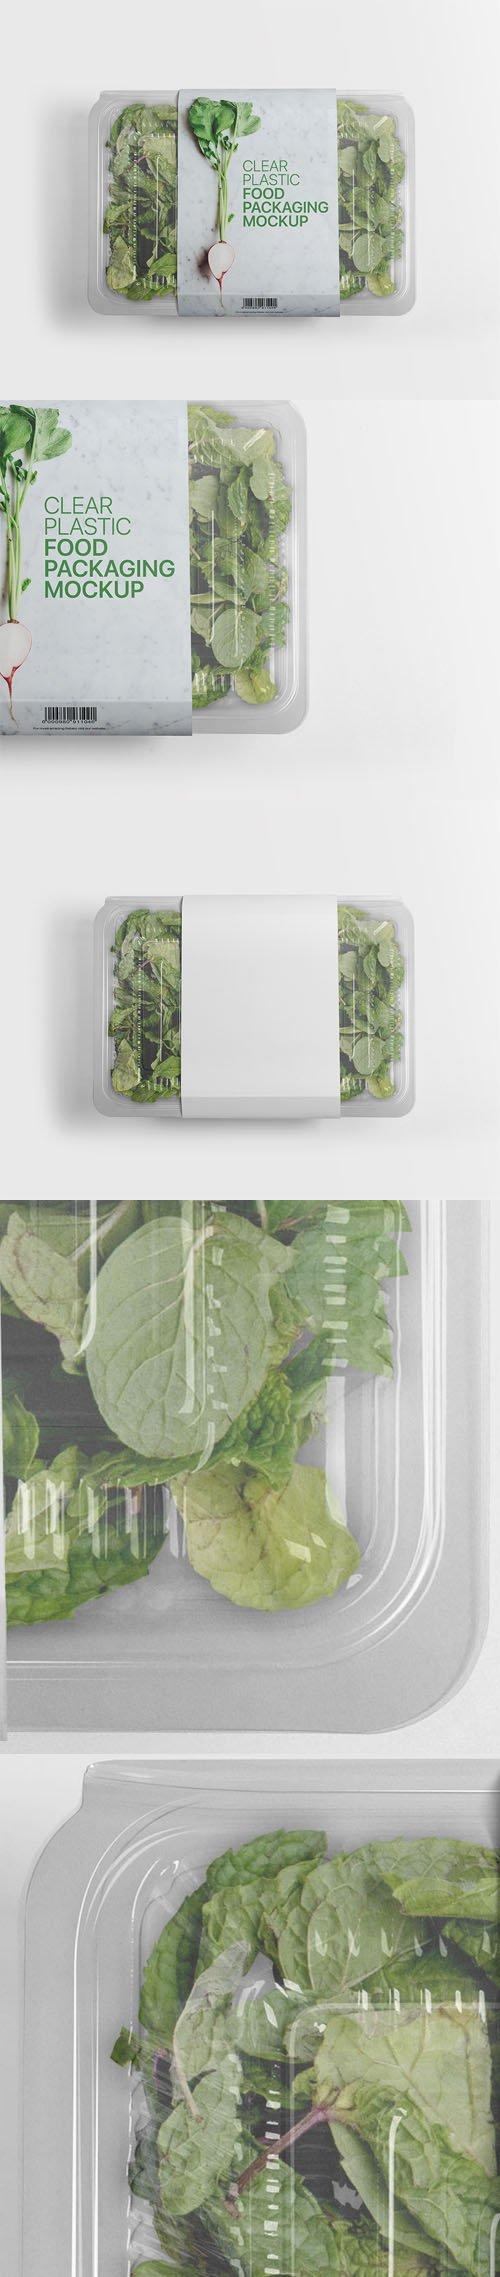 Plastic Food Packaging PSD Mockup Template